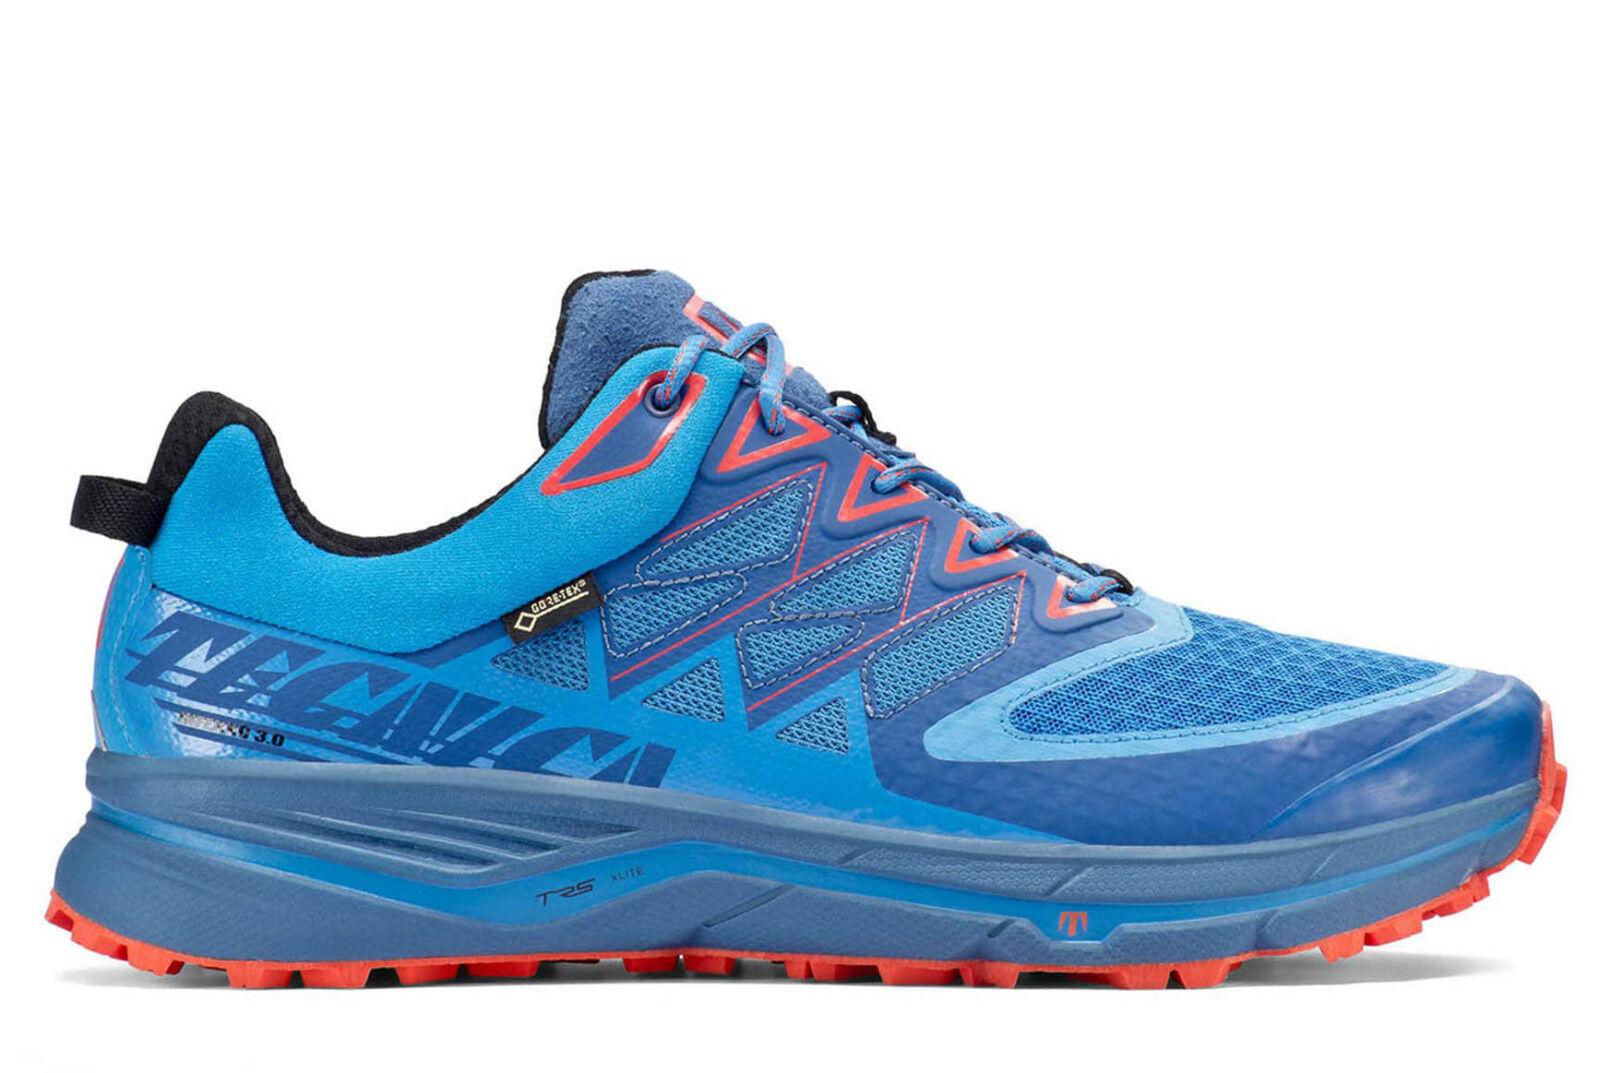 Tecnica trailschuh Inferno xlite 3.0 GTX UE us 9 zapato azul MN j18